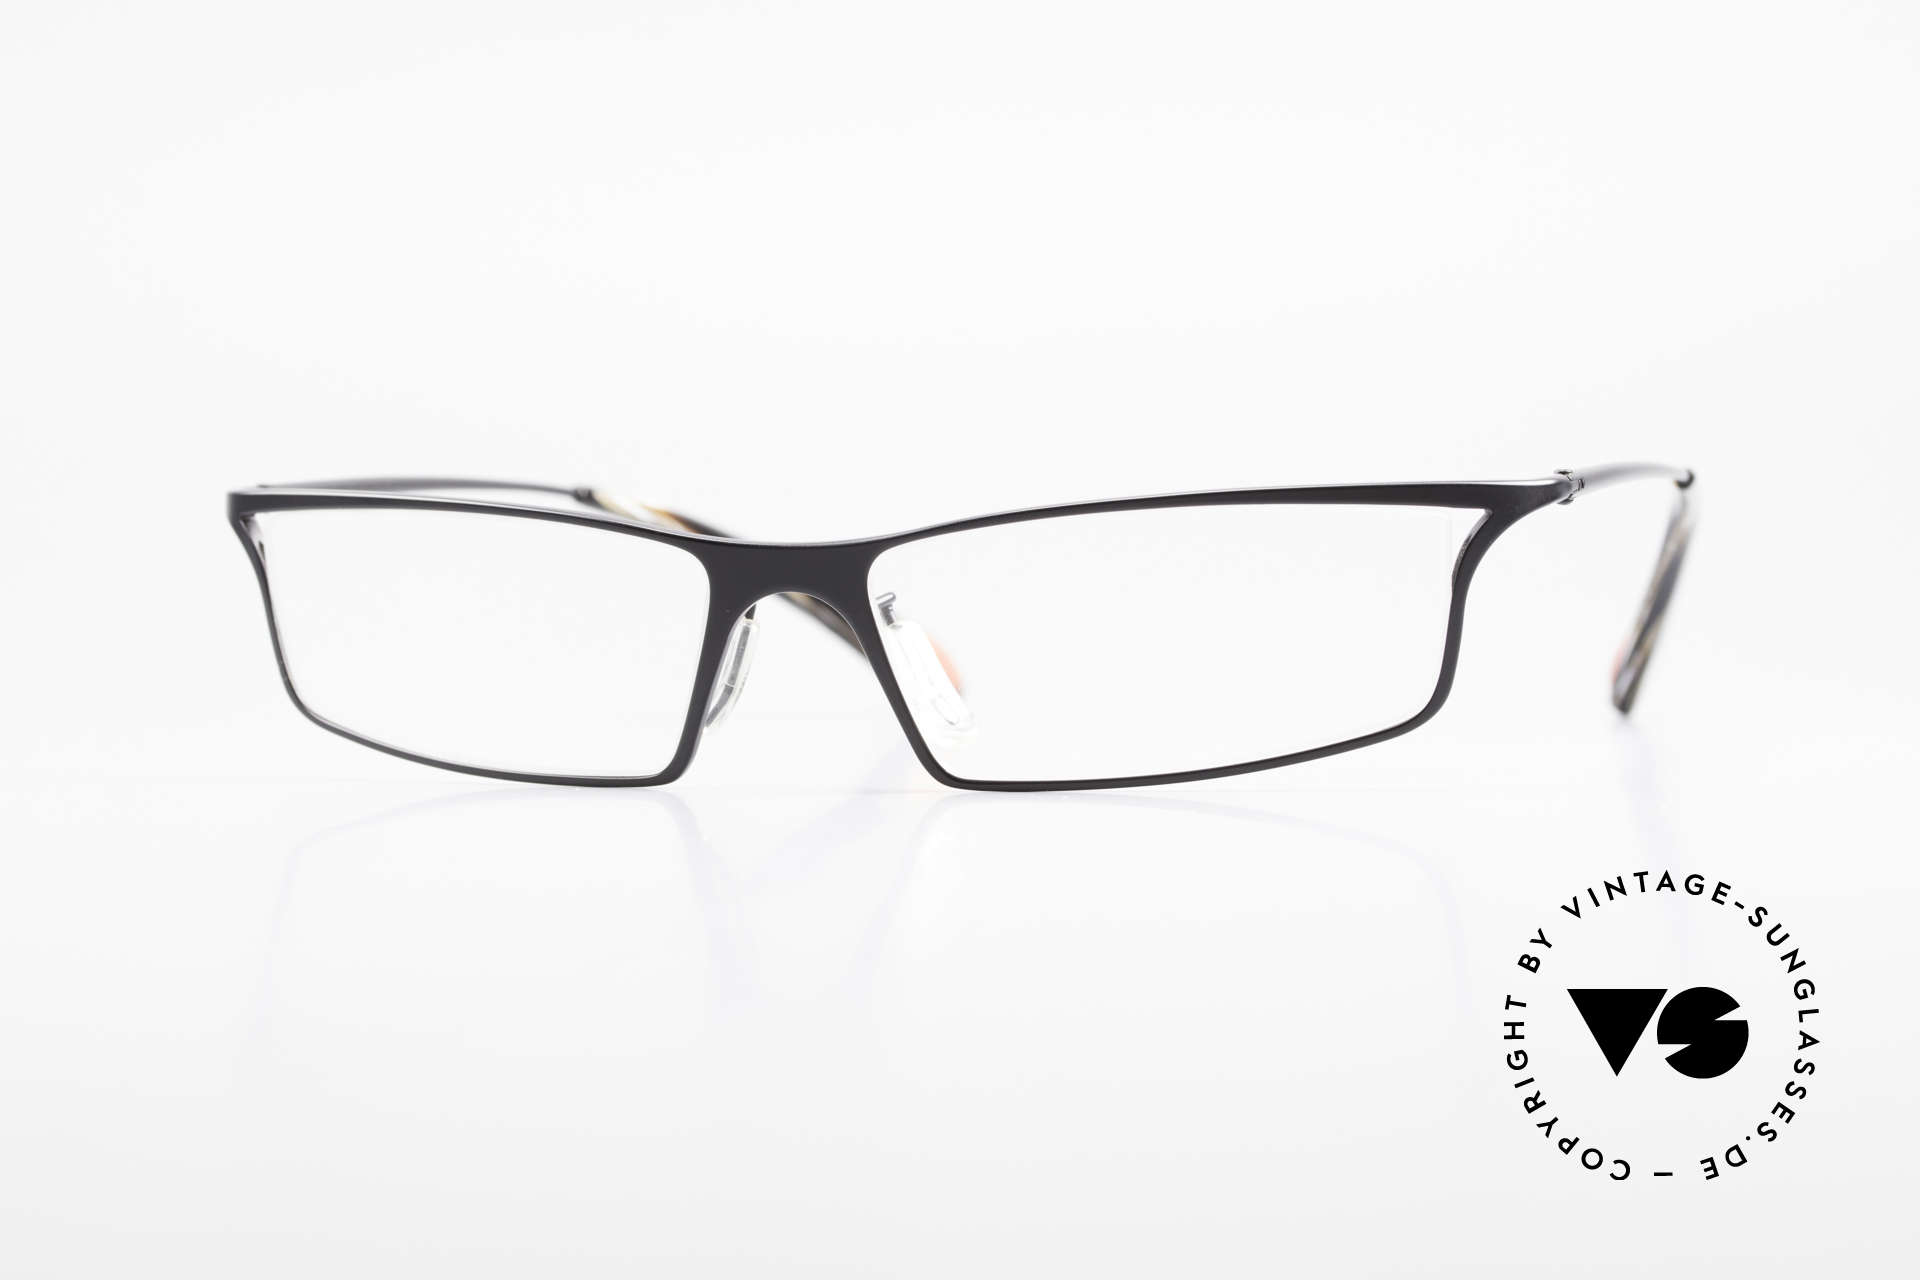 Bugatti 352 Odotype Heston Blumenthal Spectacles, original BUGATTI high-tech eyeglass-frame, Made for Men